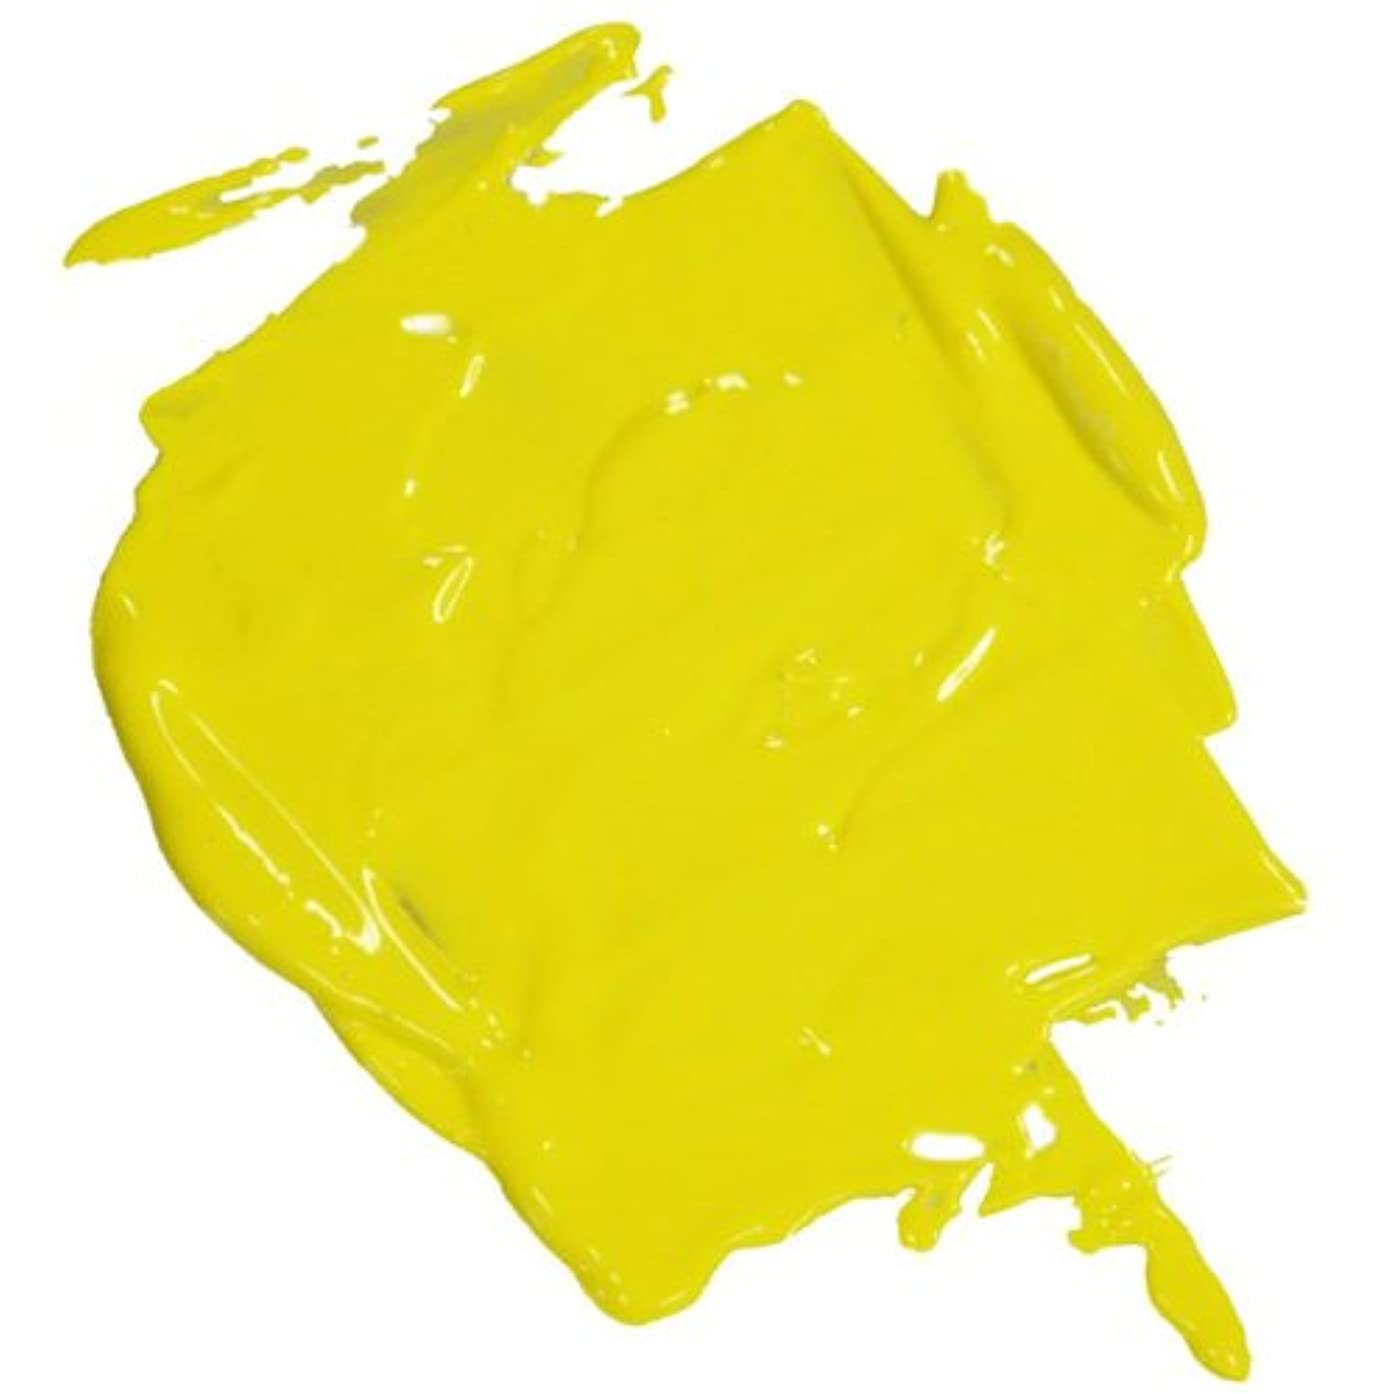 Speedball SPD-3405 Water Soluble Block Printing Ink, 1.3 oz, Yellow